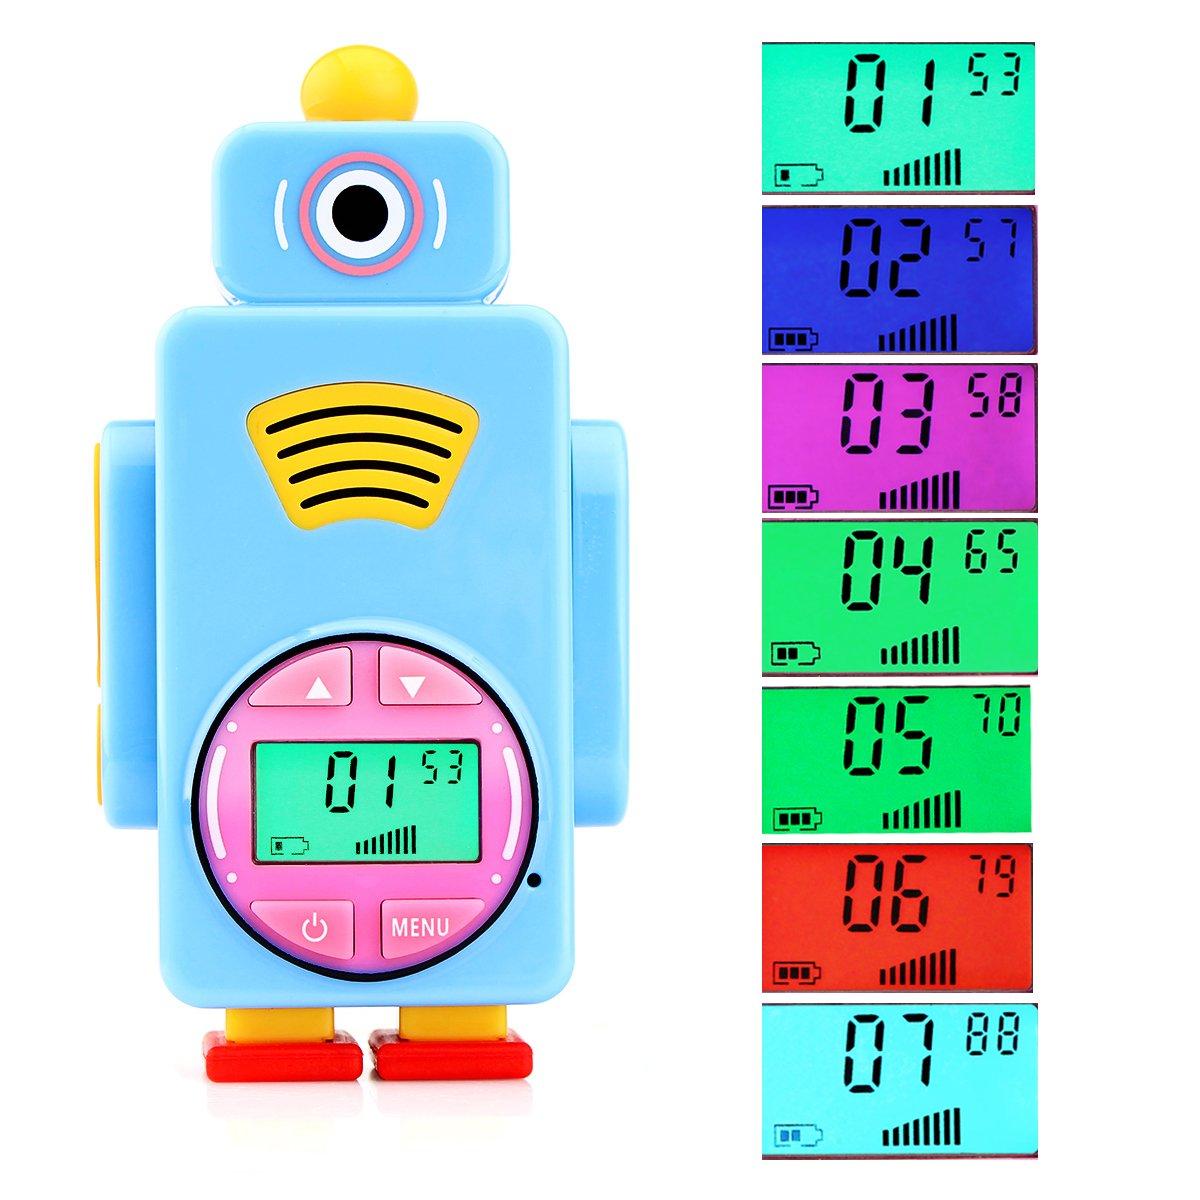 Retevis RT36 Kids Walkie Talkies Rechargeable Battery USB Charging Flashlight Long Range Crystal Sound License Free Walkie Talkies for Kids (Blue,2 Pack) by Retevis (Image #6)